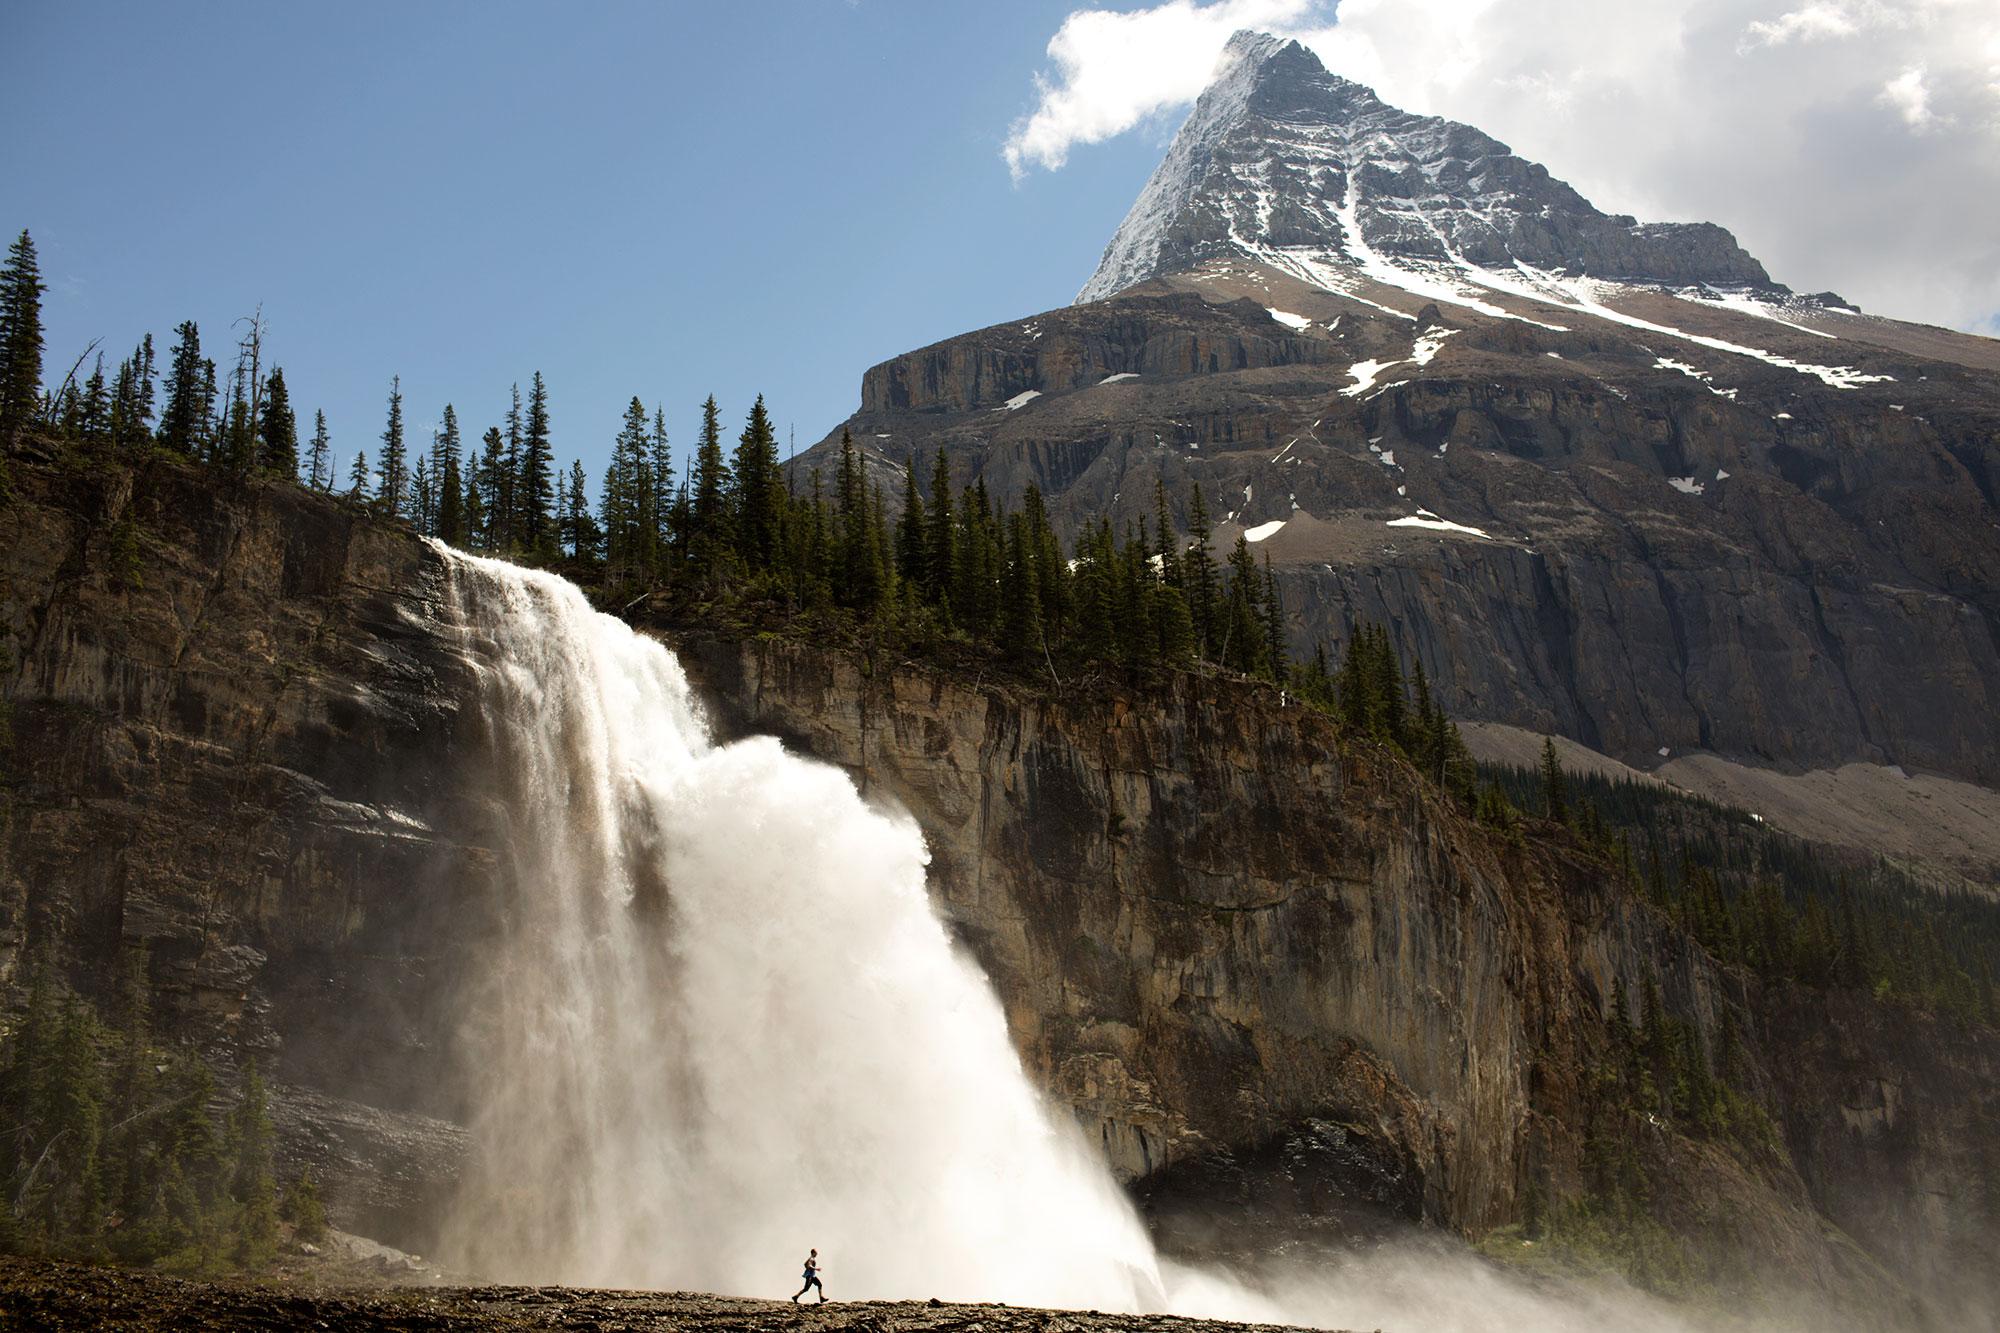 12-Bec_Kilpatrick_Photography_CanadaBEC_6101